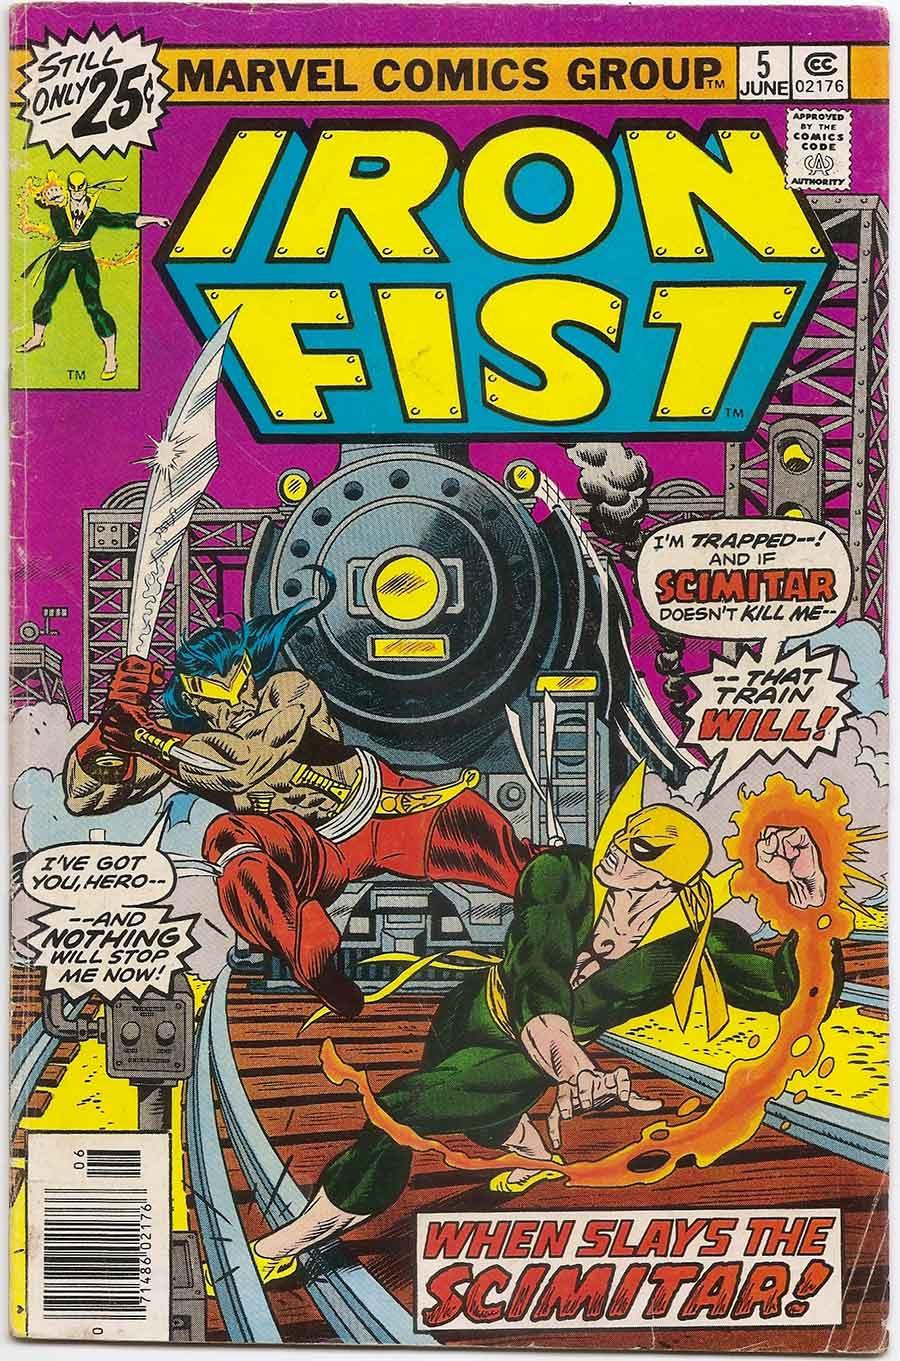 Iron fist shop